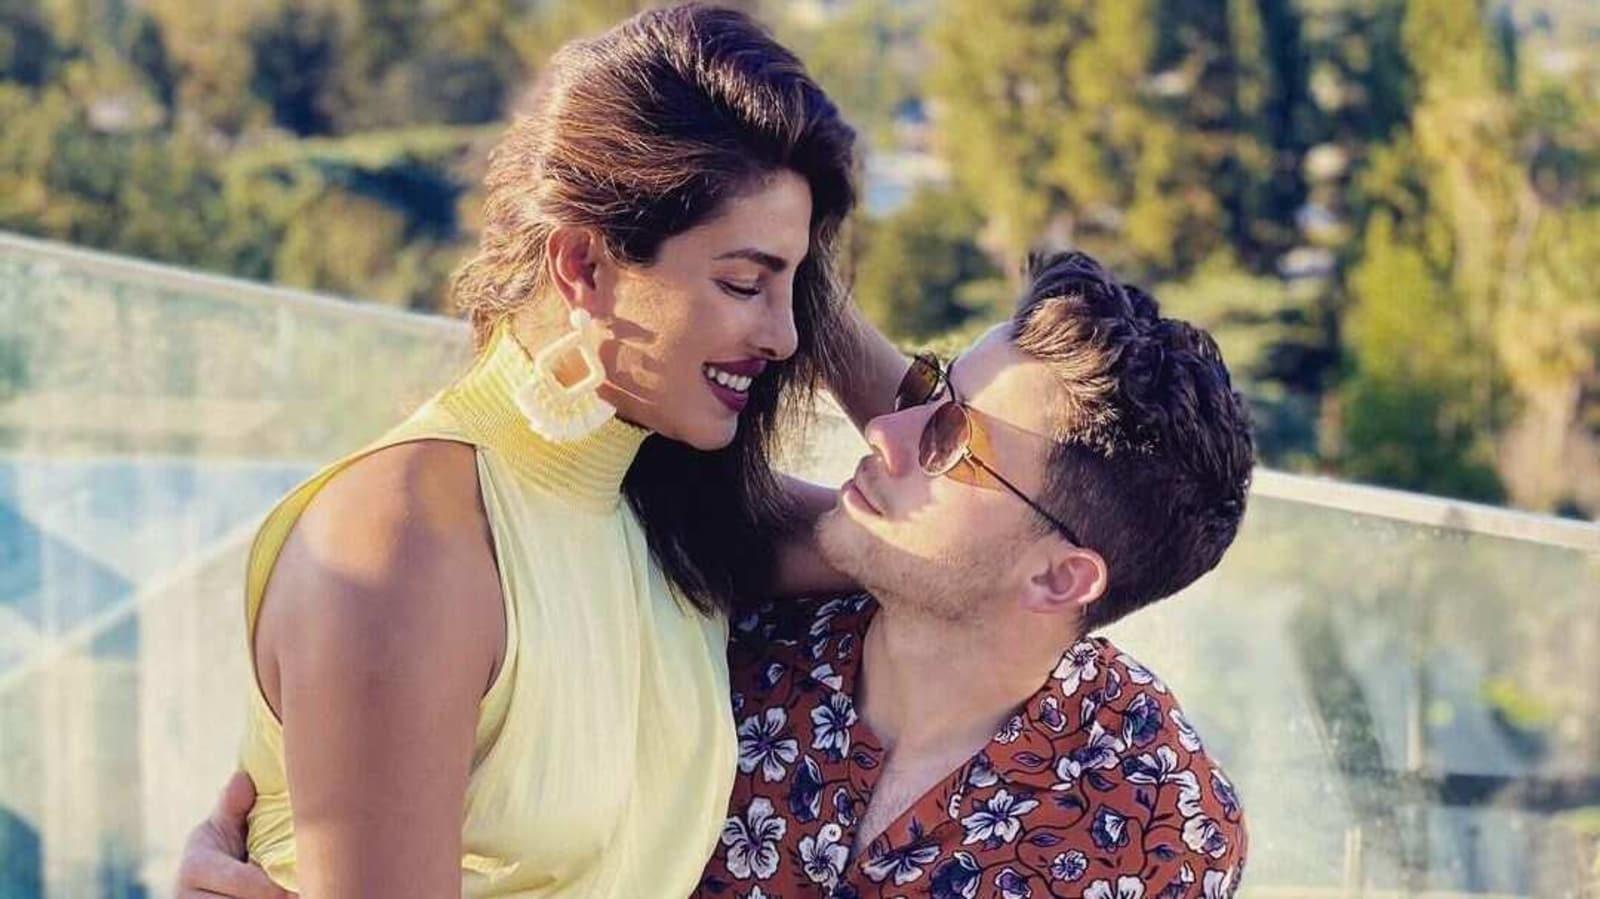 Nick Jonas reveals Spaceman songs are love letters to Priyanka Chopra: 'It makes her happy' - Hindustan Times